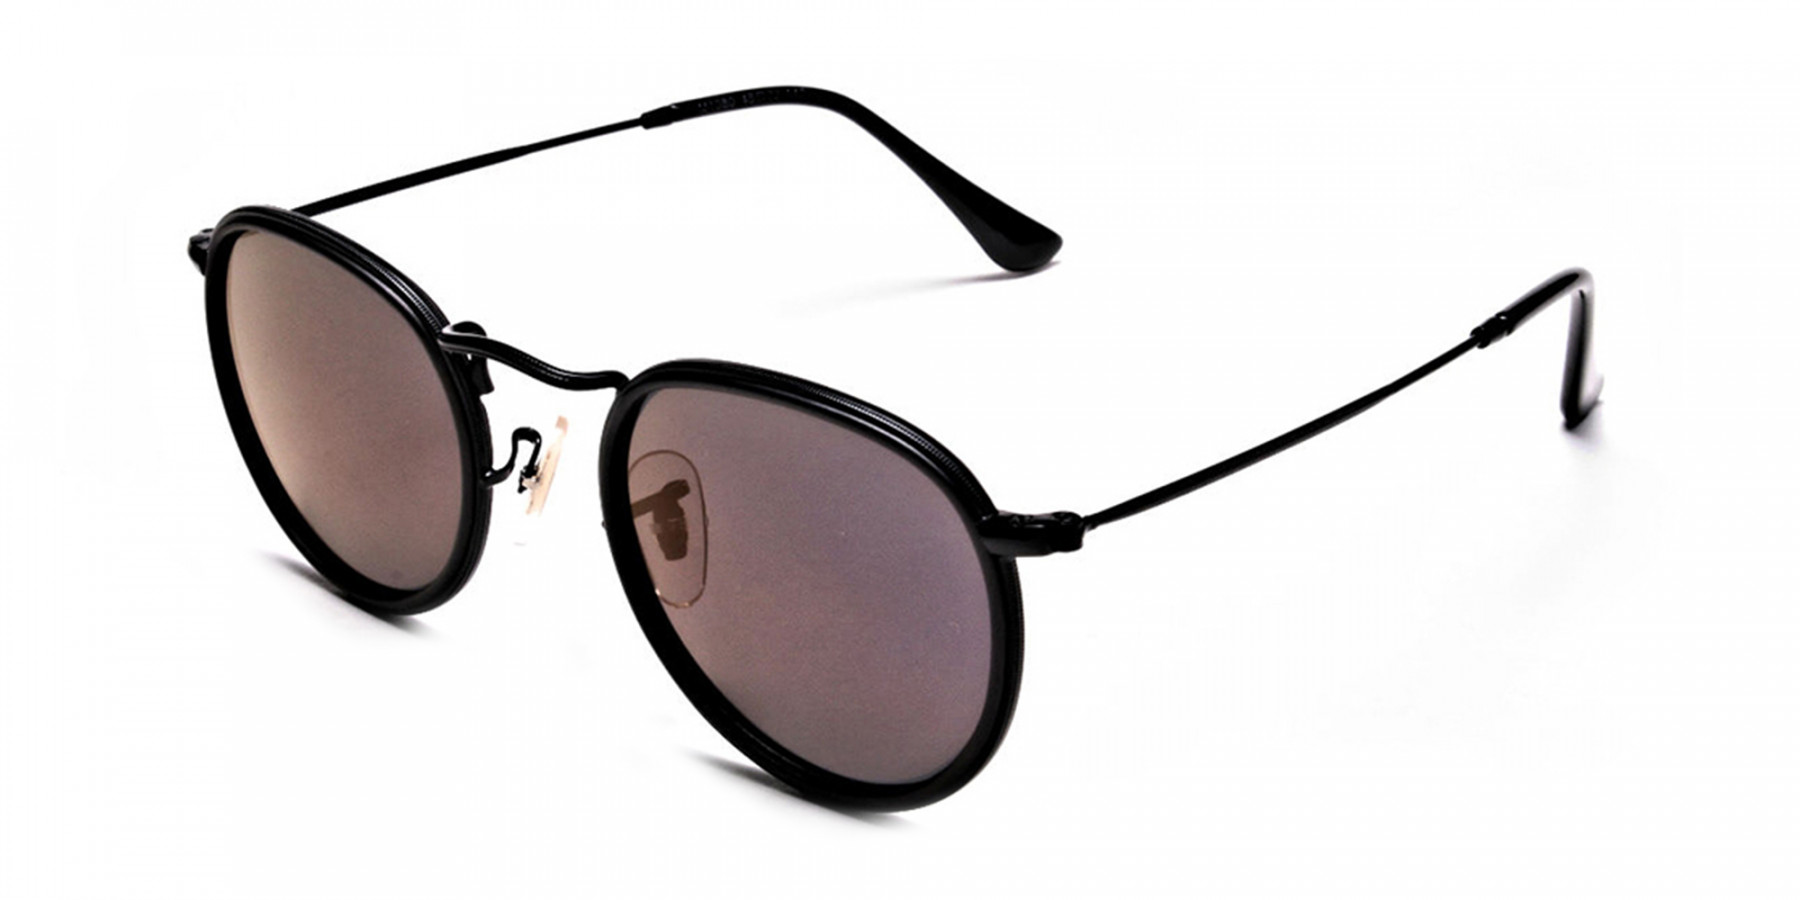 Purple Round Sunglasses for Men and Women - 2